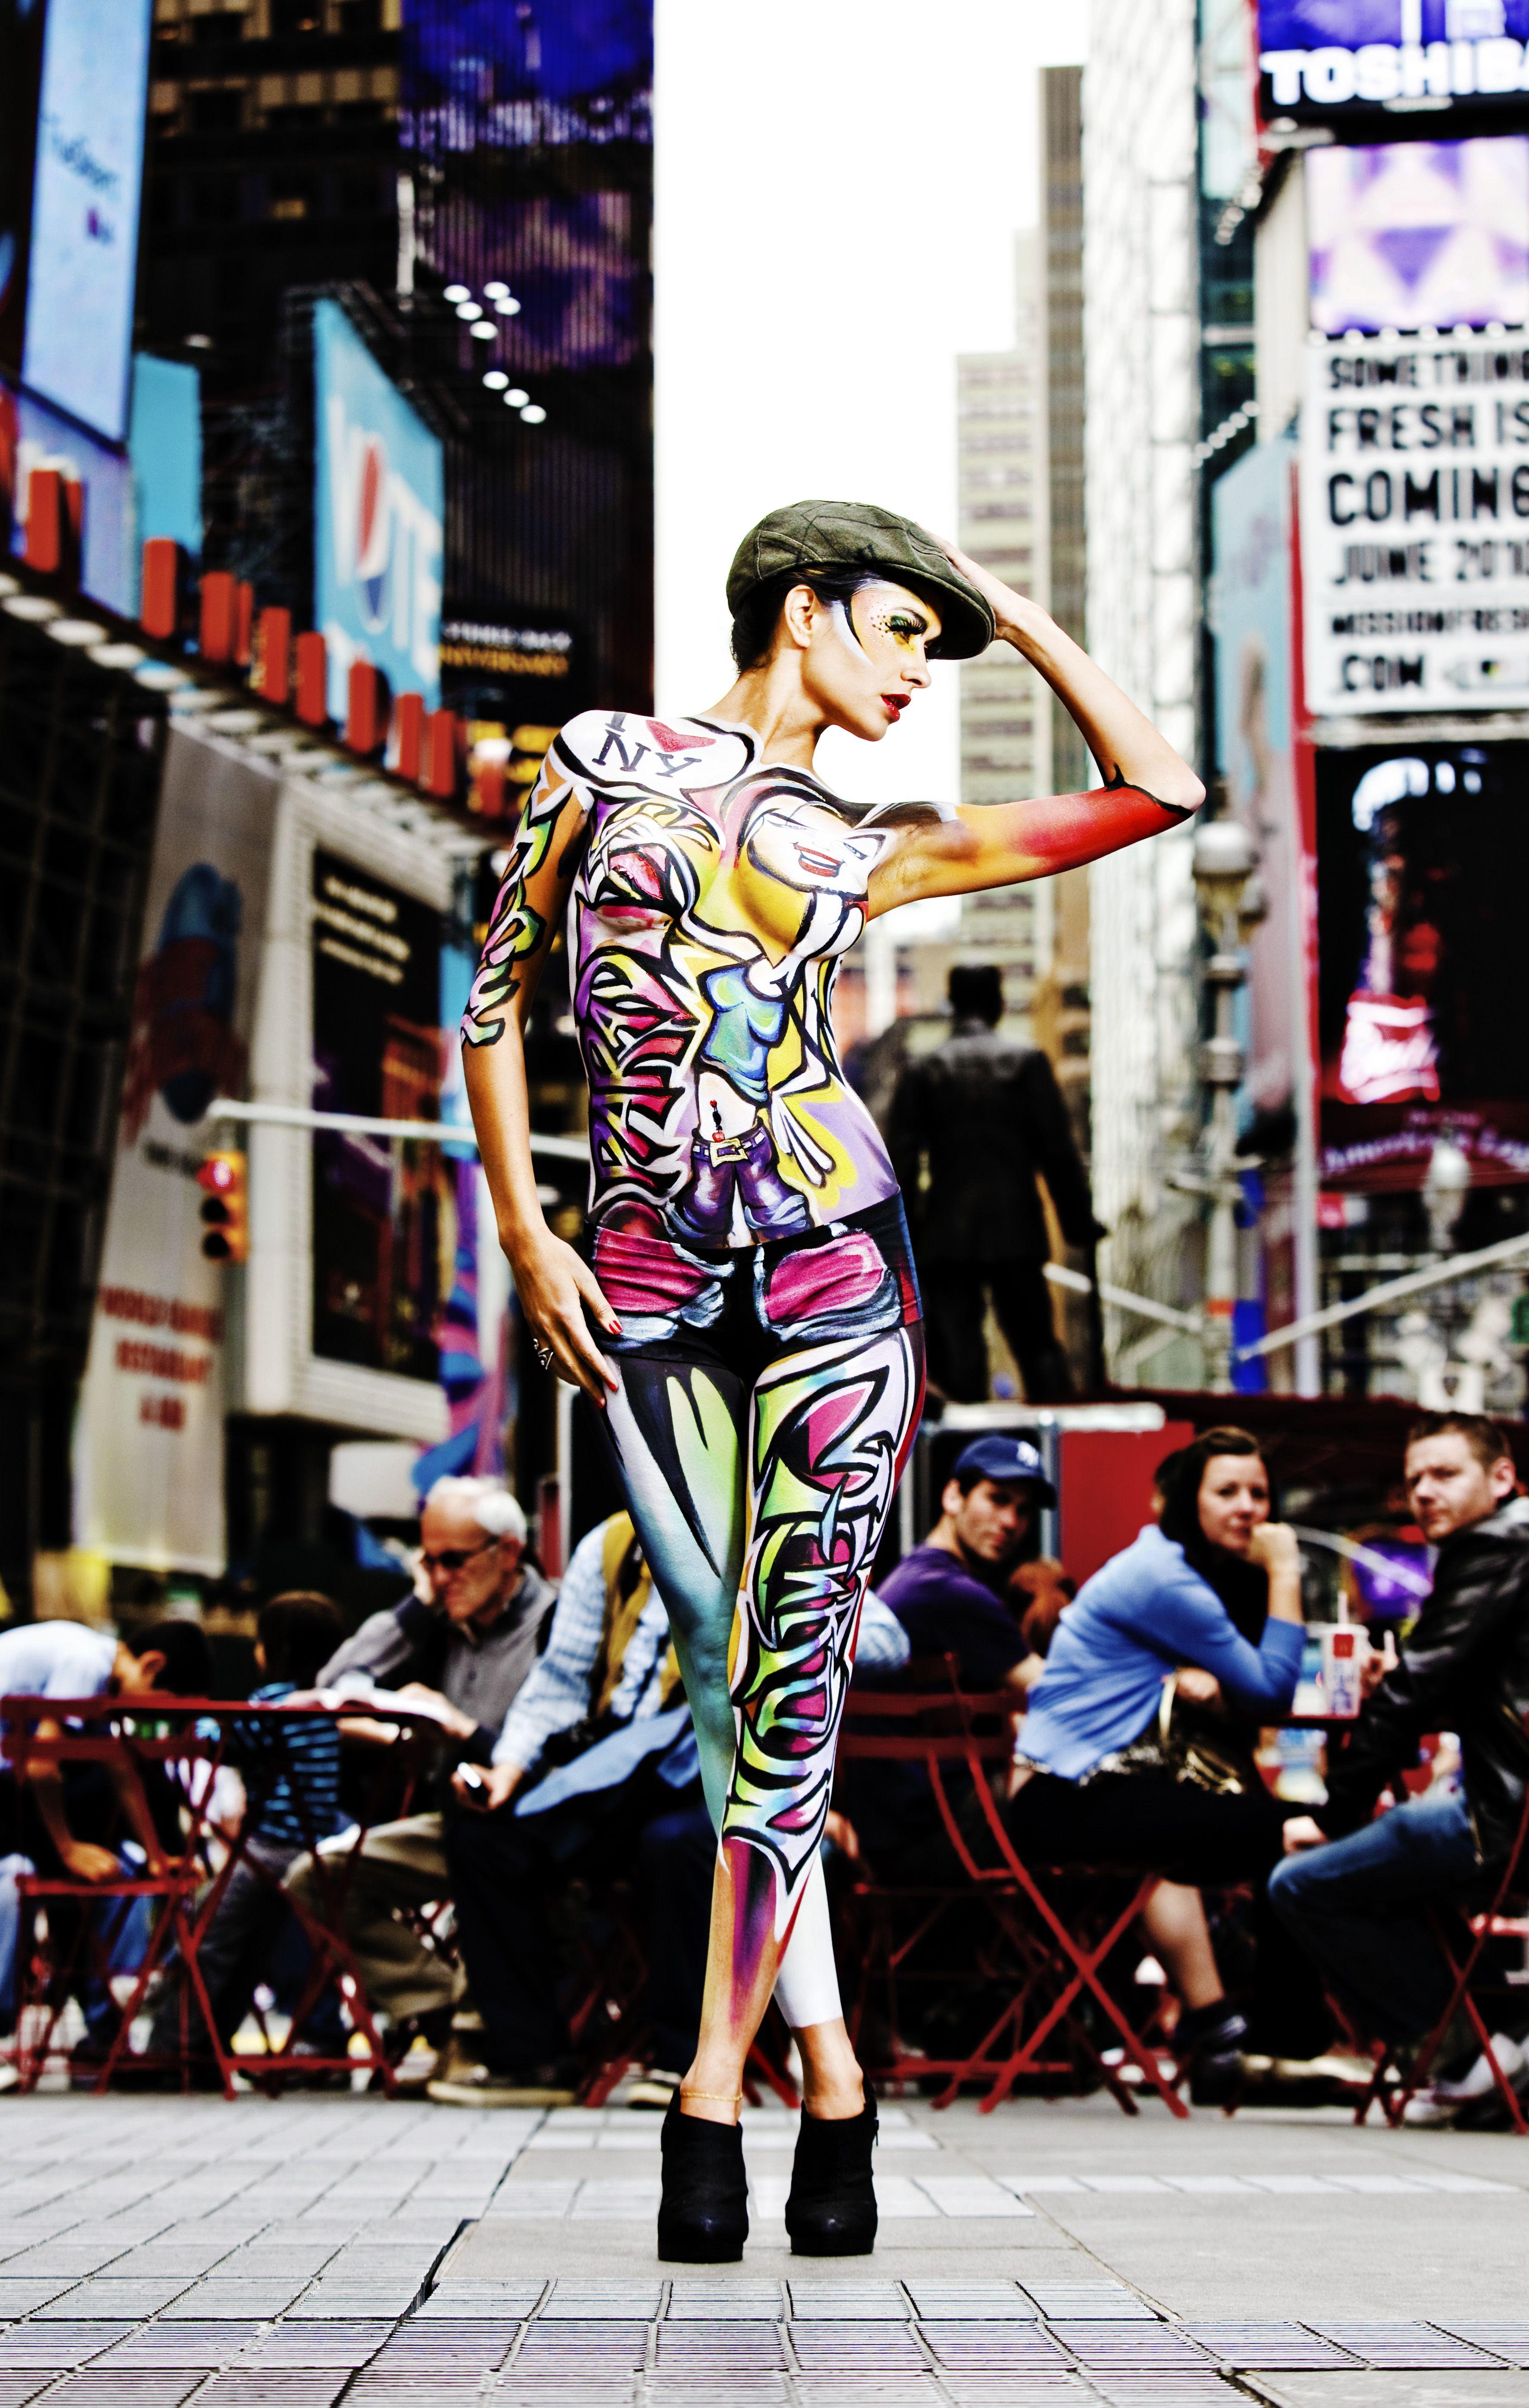 Jinny New York Paradise Makeup Aq Body Painting Body